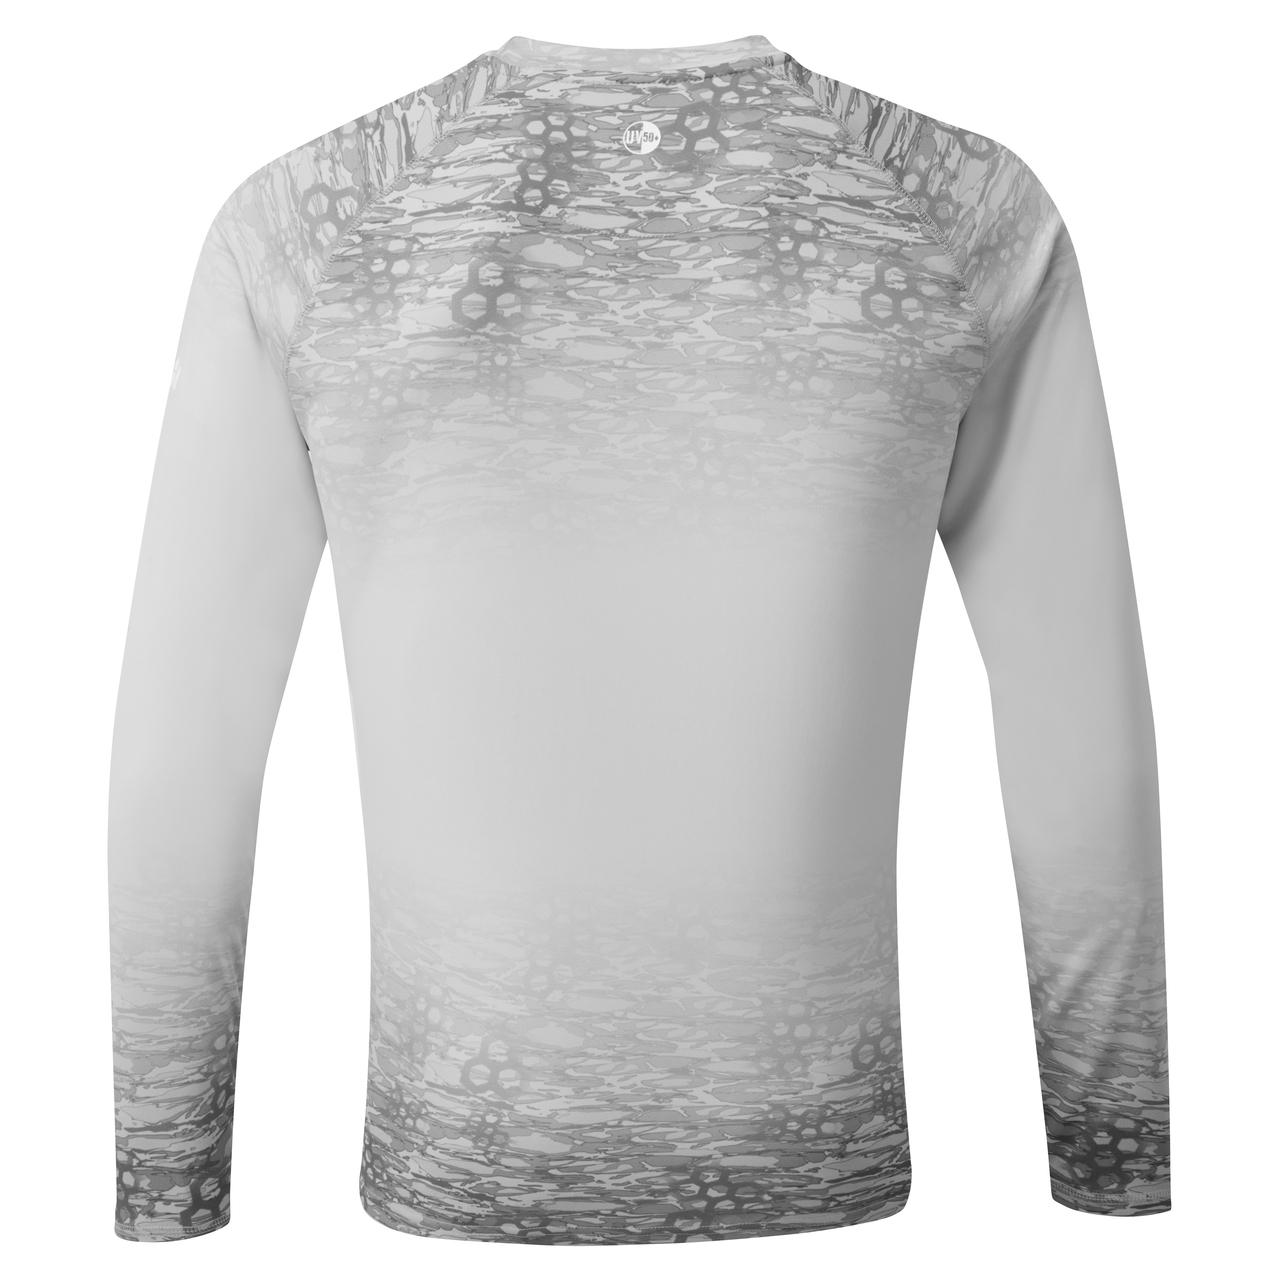 Men's UV Tec Tee - Long Sleeve - UV011-ICE01-3.jpg